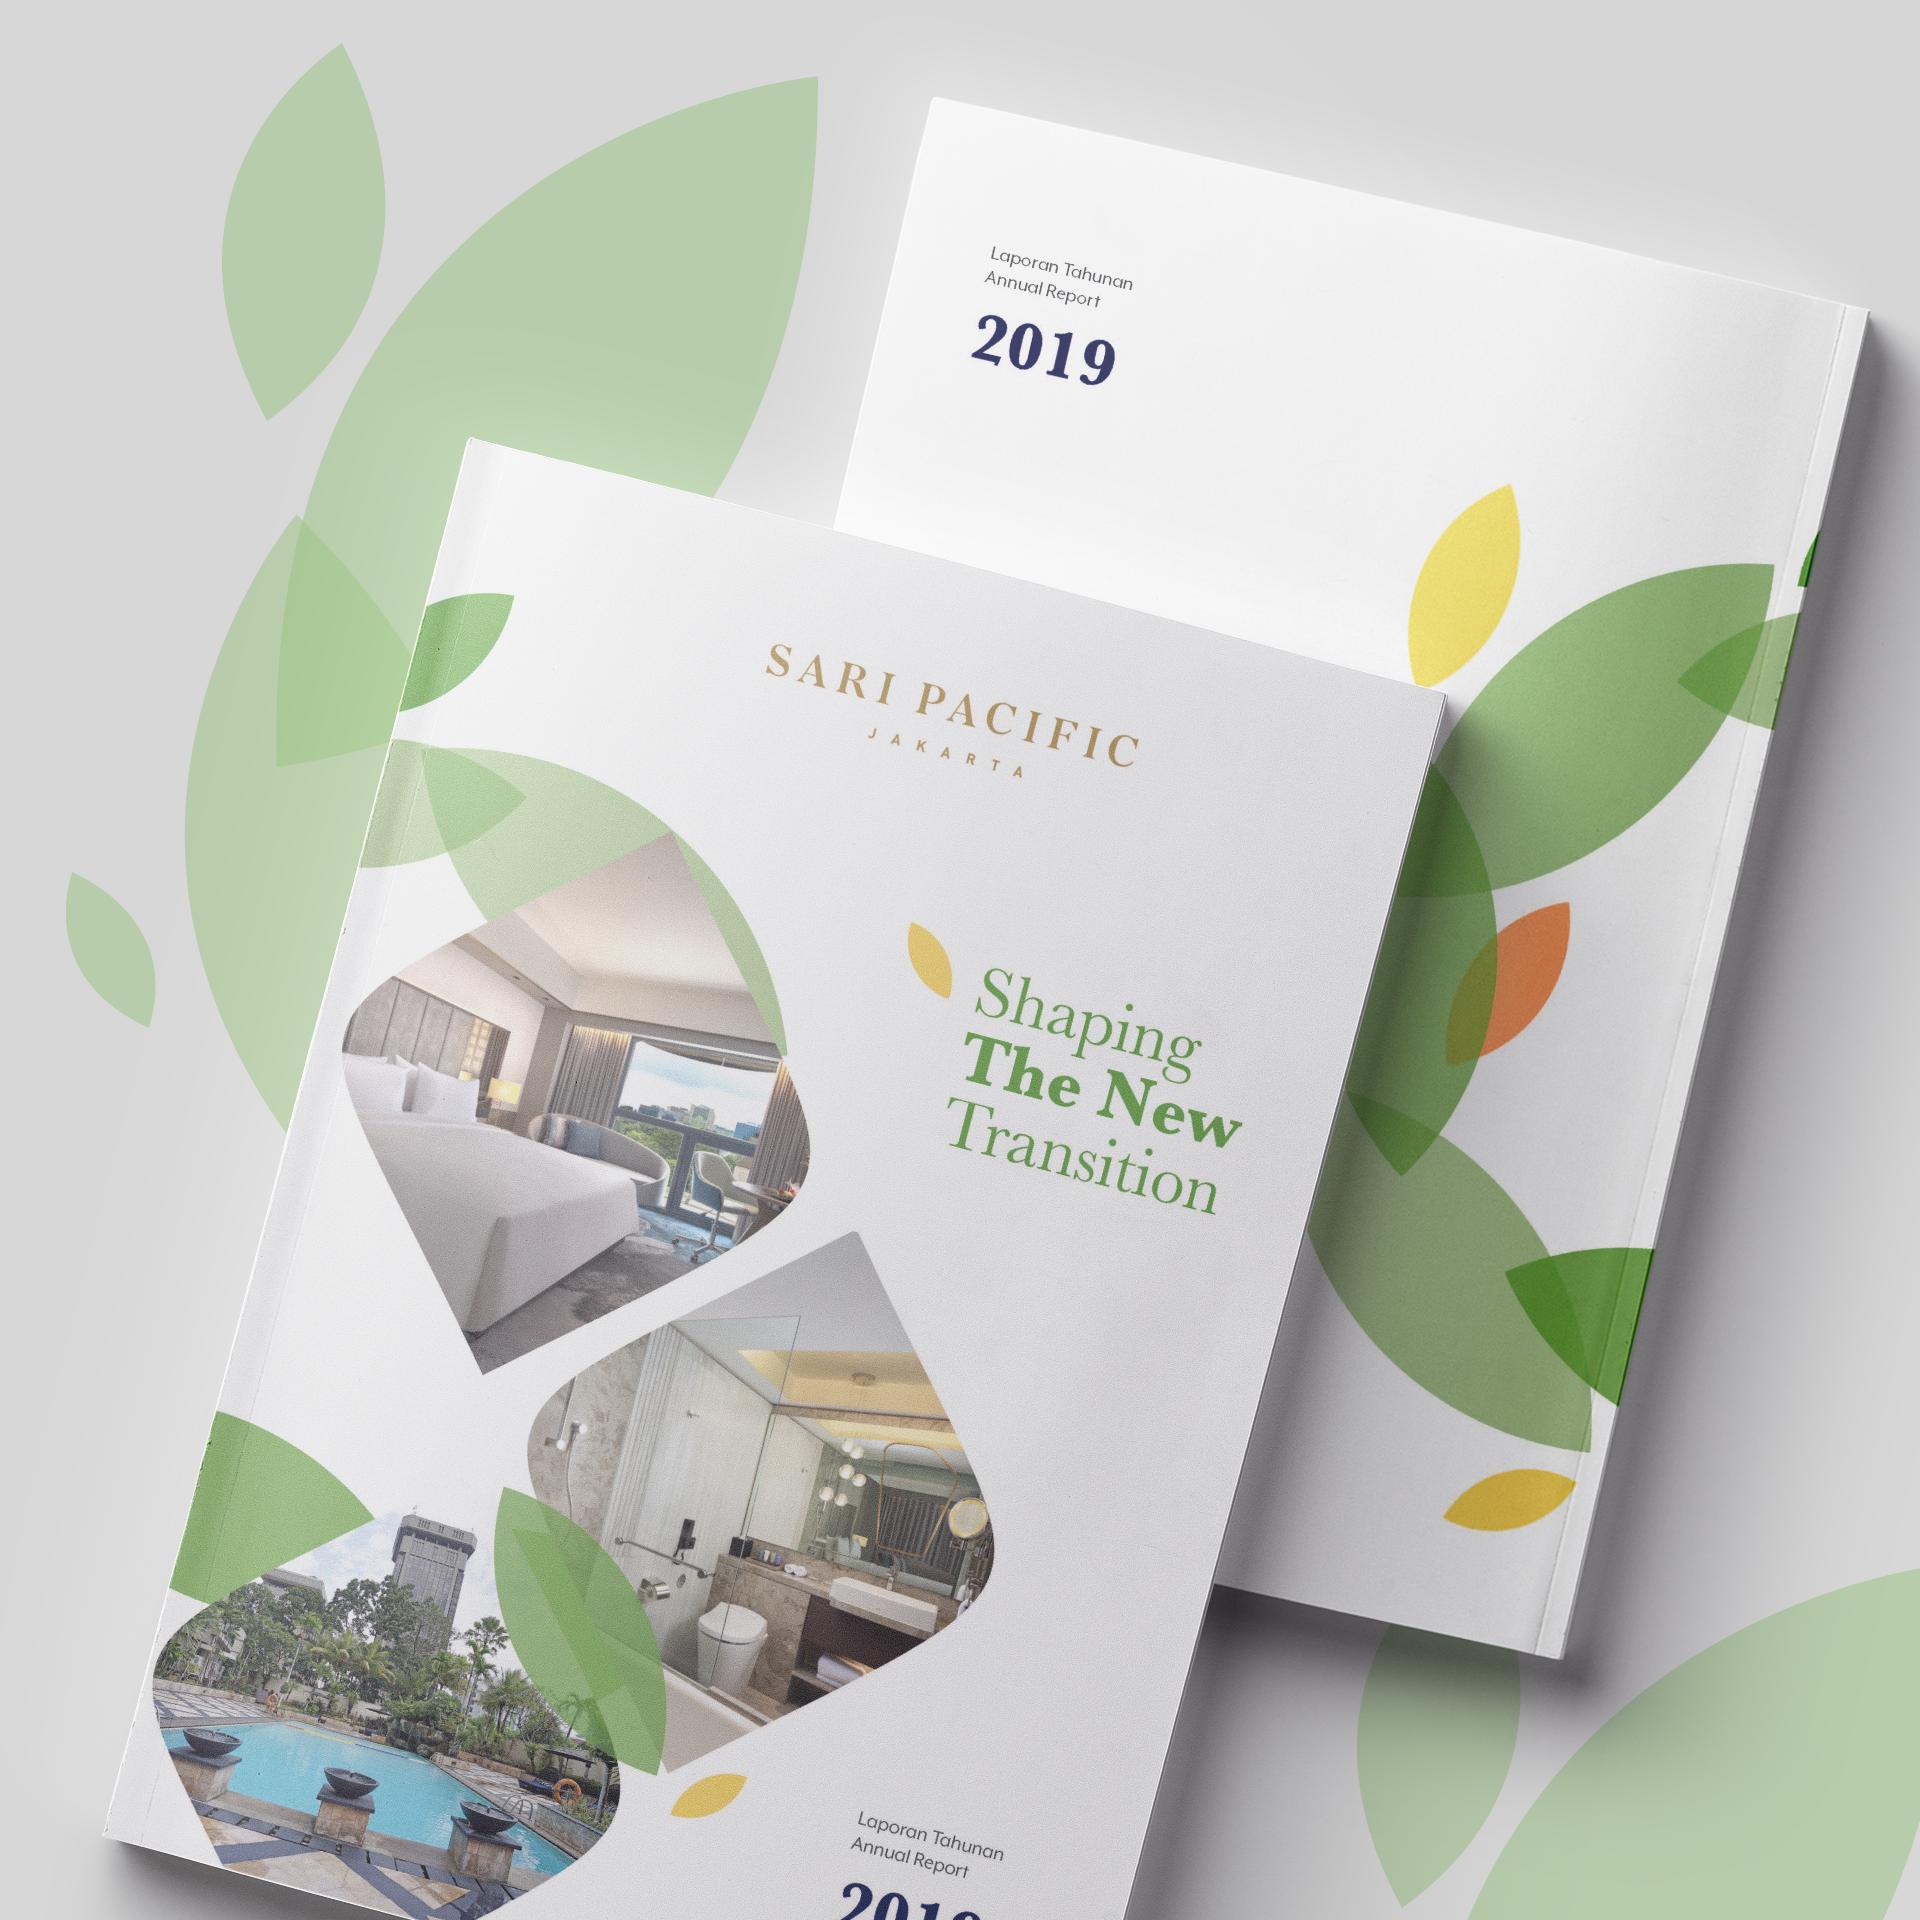 annual report sari pacific jakarta 2019